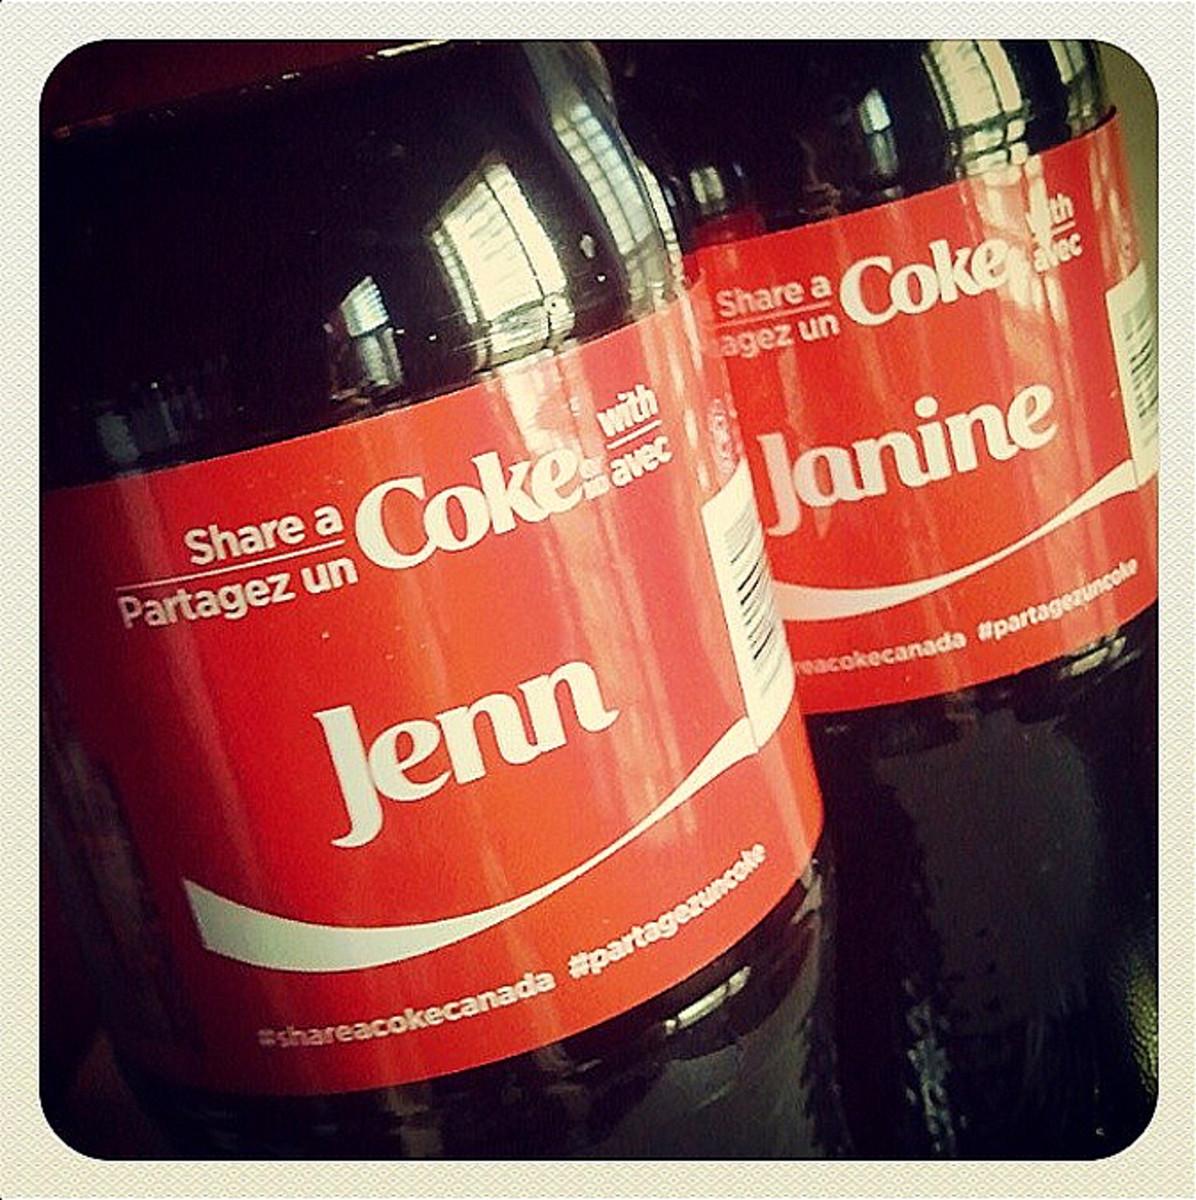 personalized coke labels_jenn and janine